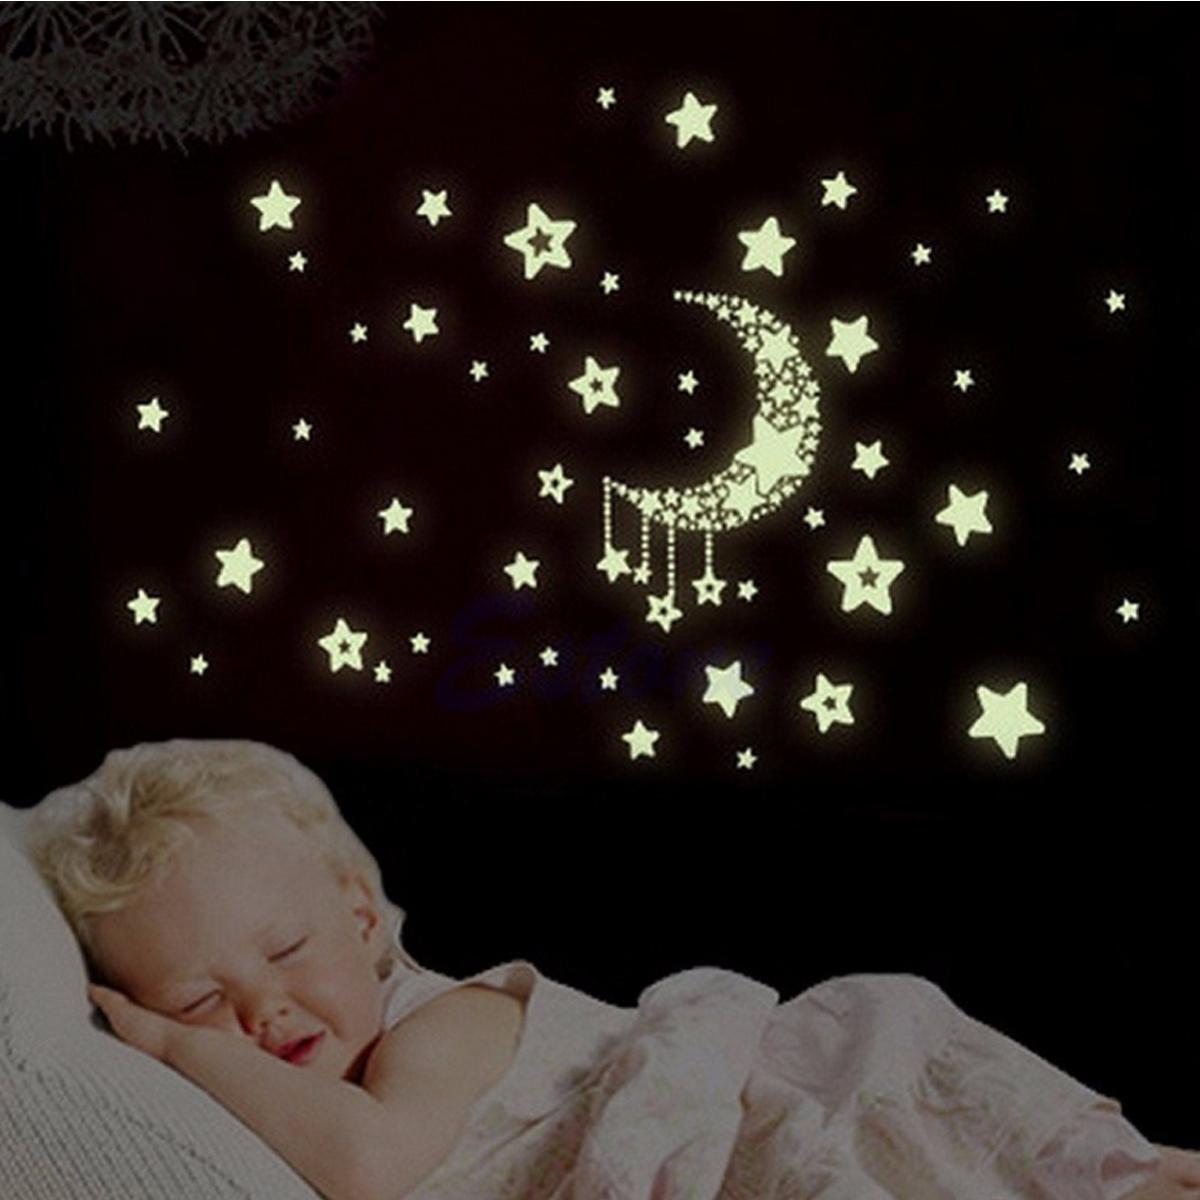 Miico Светящиеся звезды и Луны Creative ПВХ стены наклейки Home Decor Mural Art Съемные наклейки стены